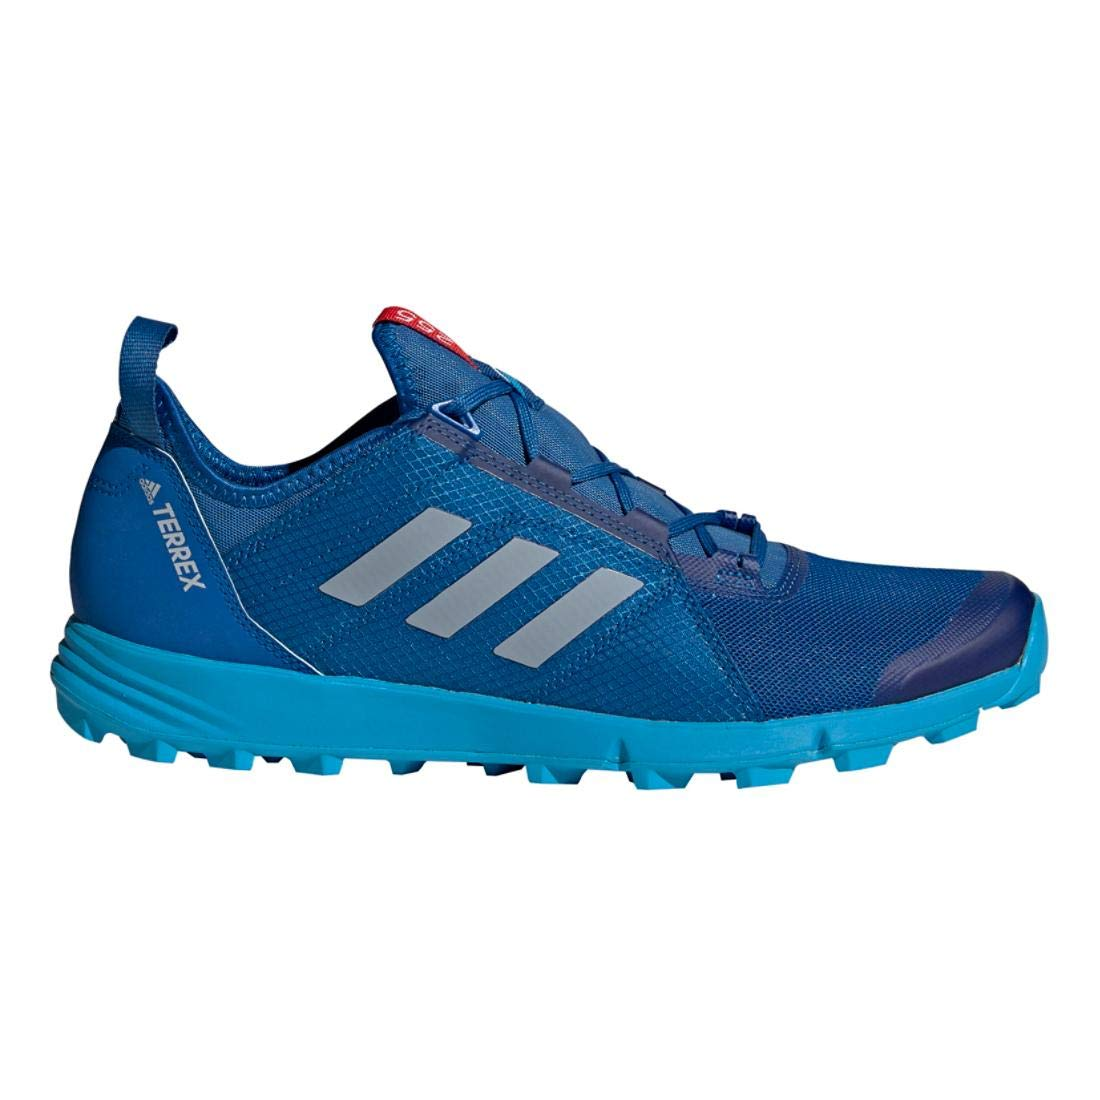 adidas outdoor Terrex Agravic Speed Trail Running Shoe Men's Blue BeautyGrey TwoShock Cyan, 11.0